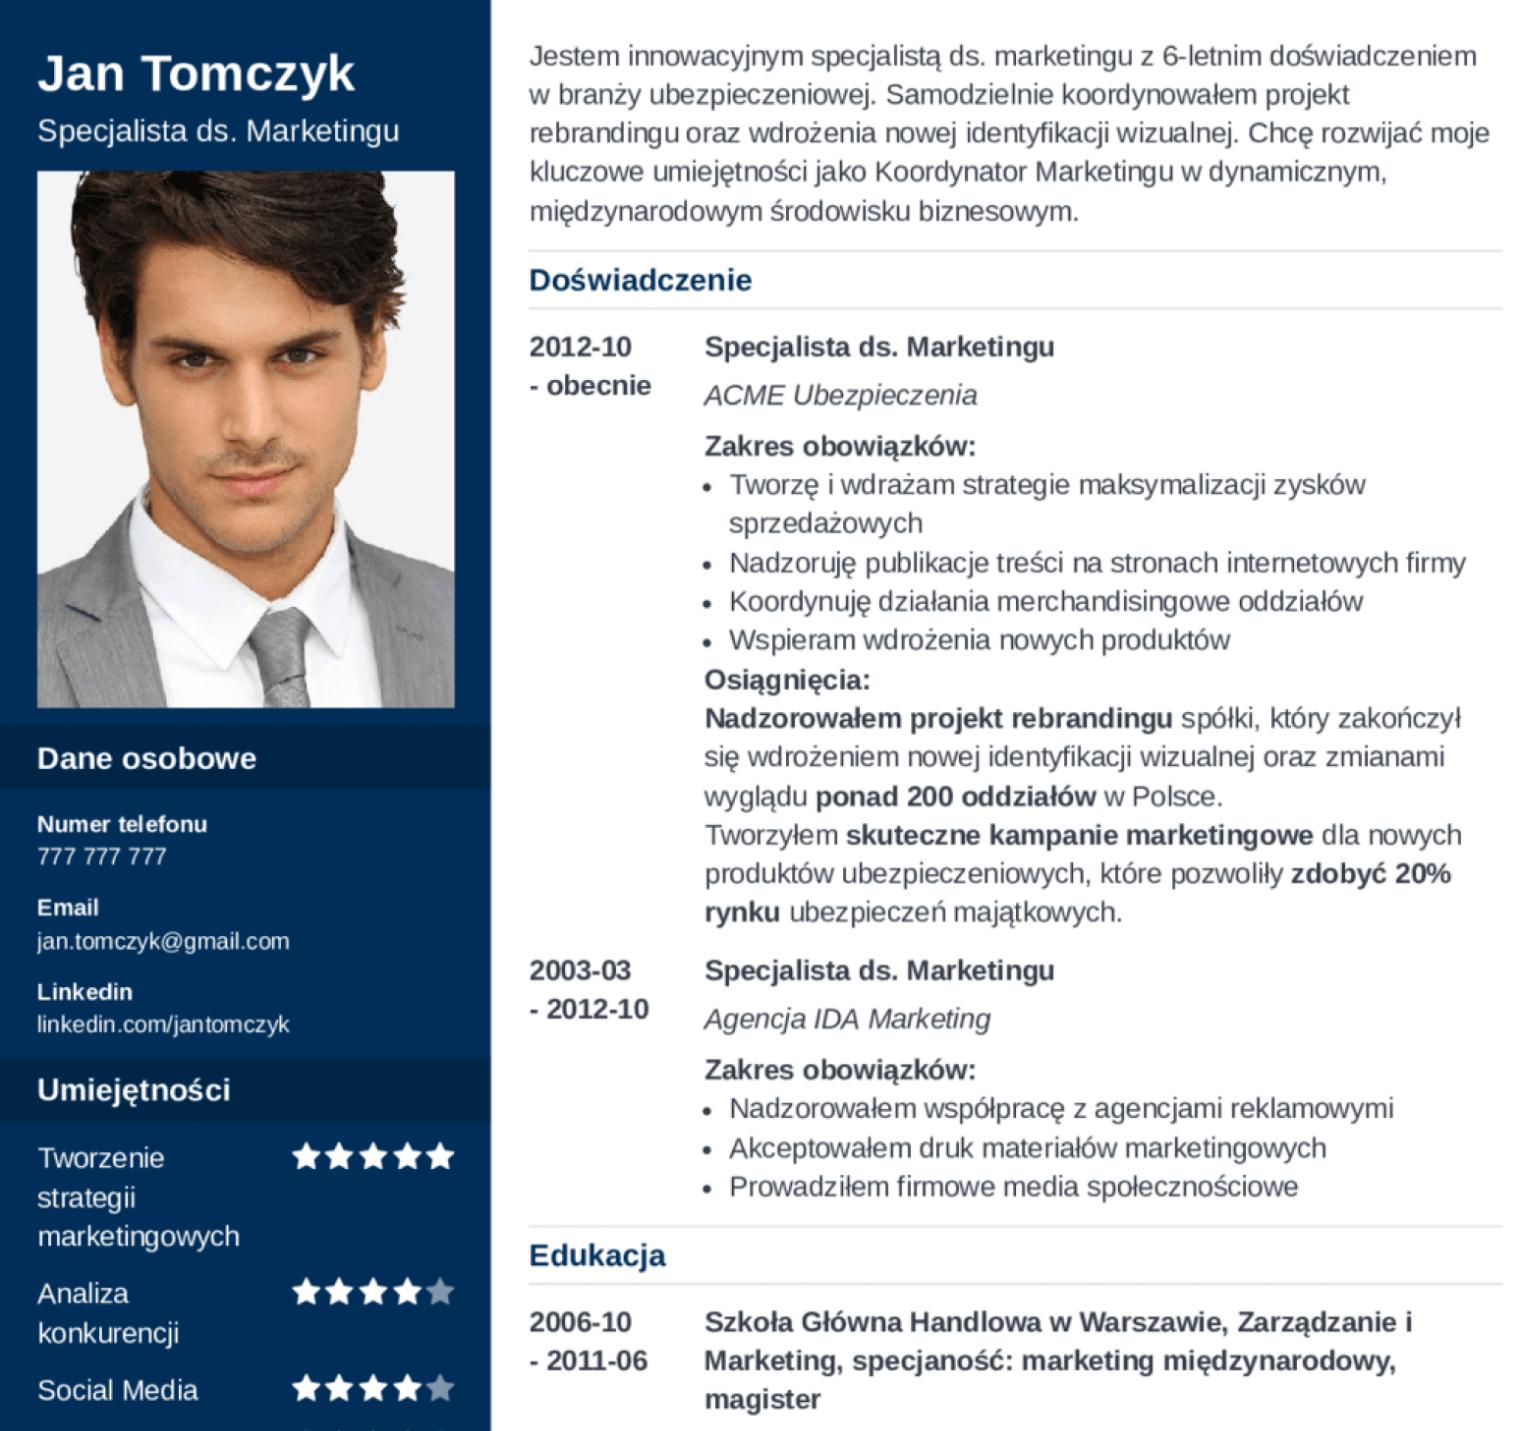 InterviewMe. Najlepszy kreator CV online.